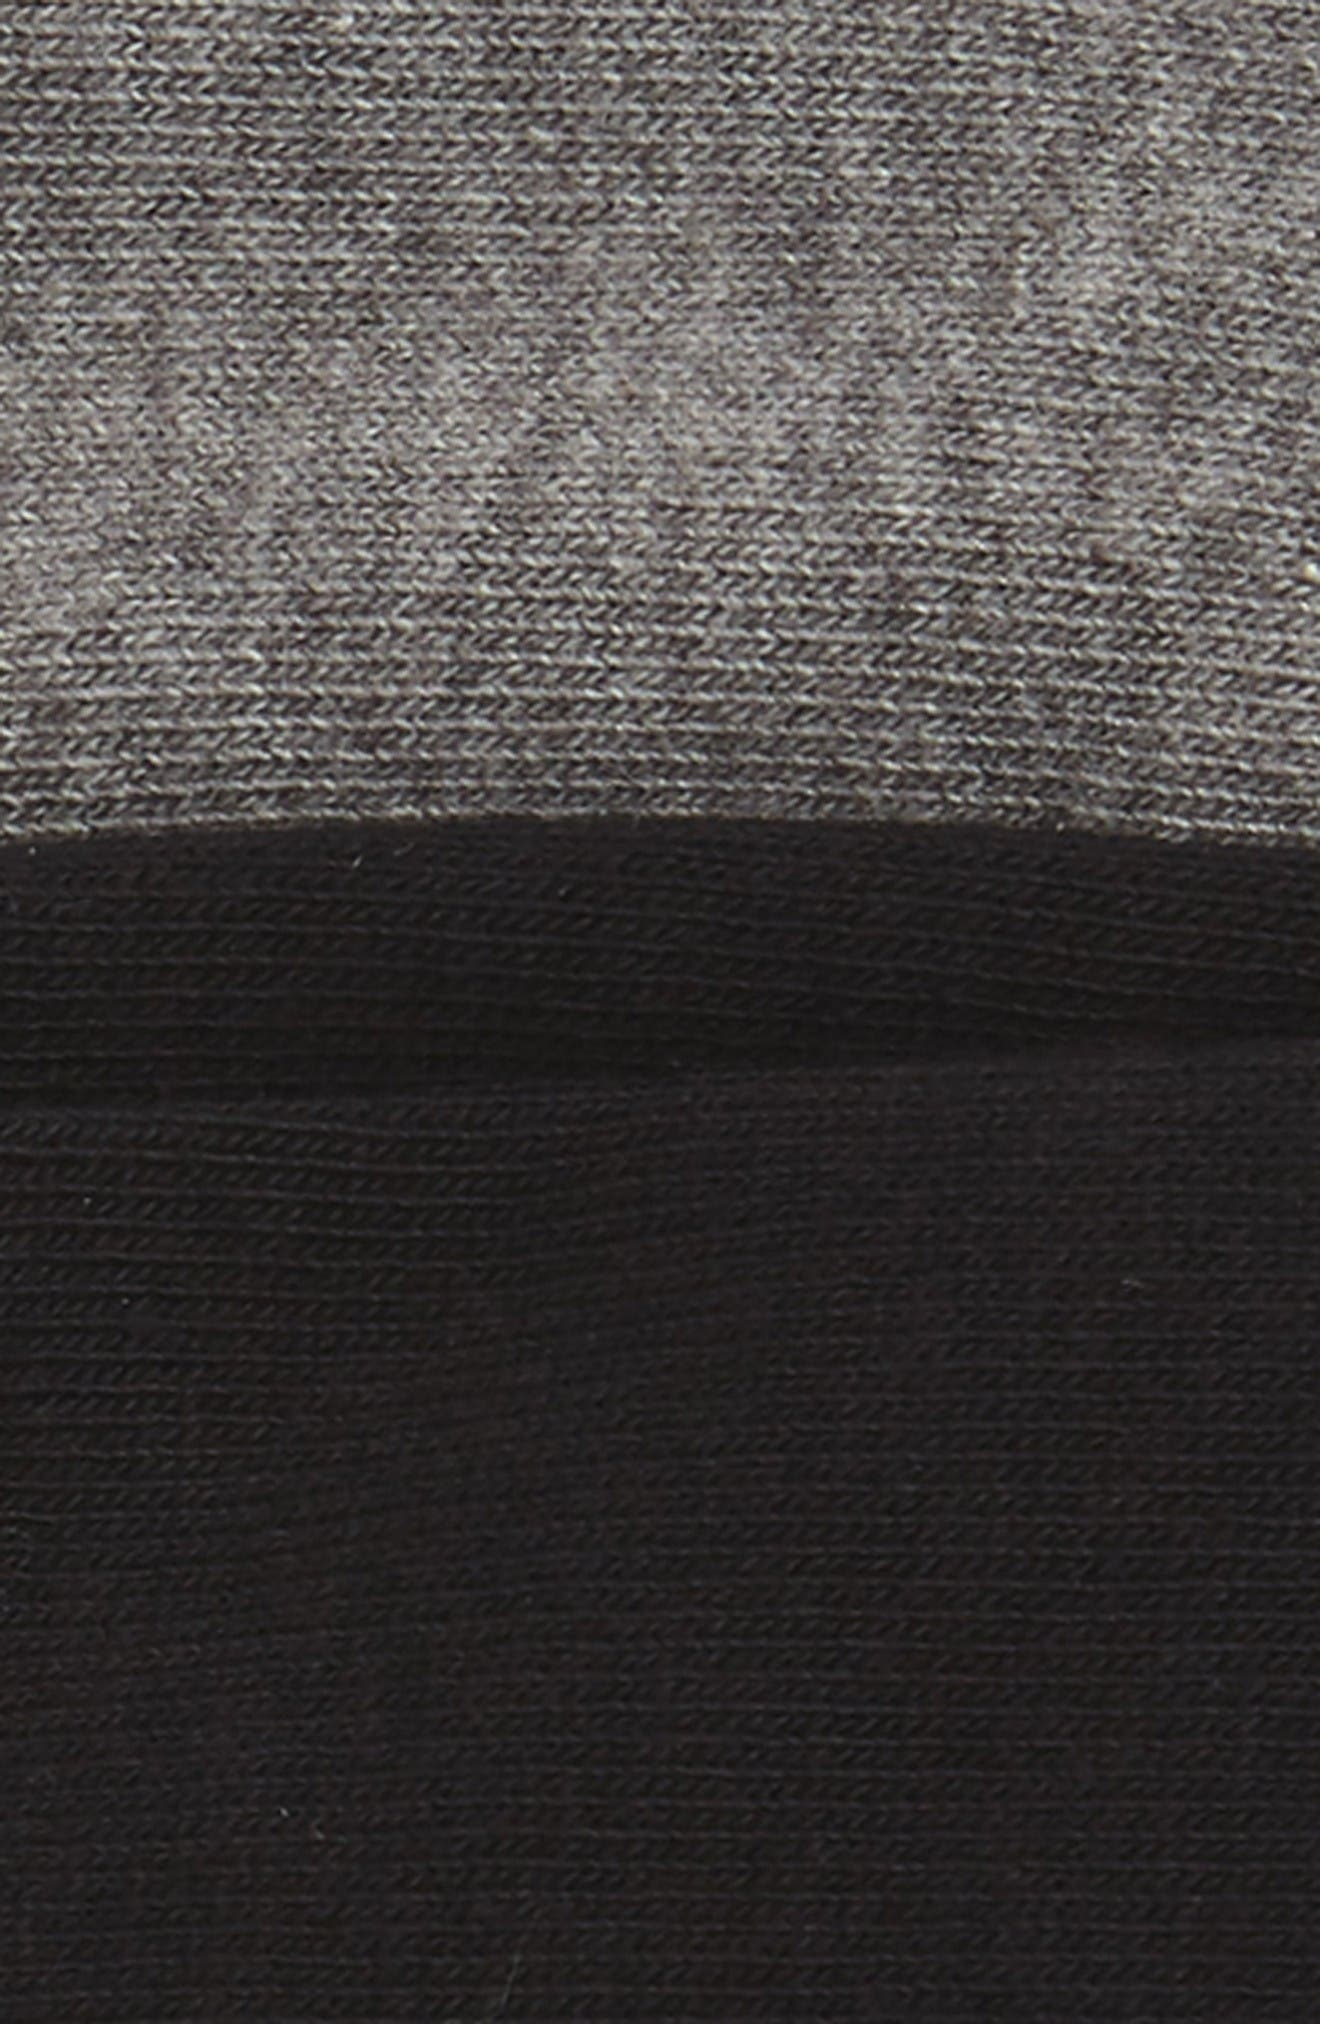 2-Pack Everyday Liner Socks,                             Alternate thumbnail 2, color,                             Black/ Grey